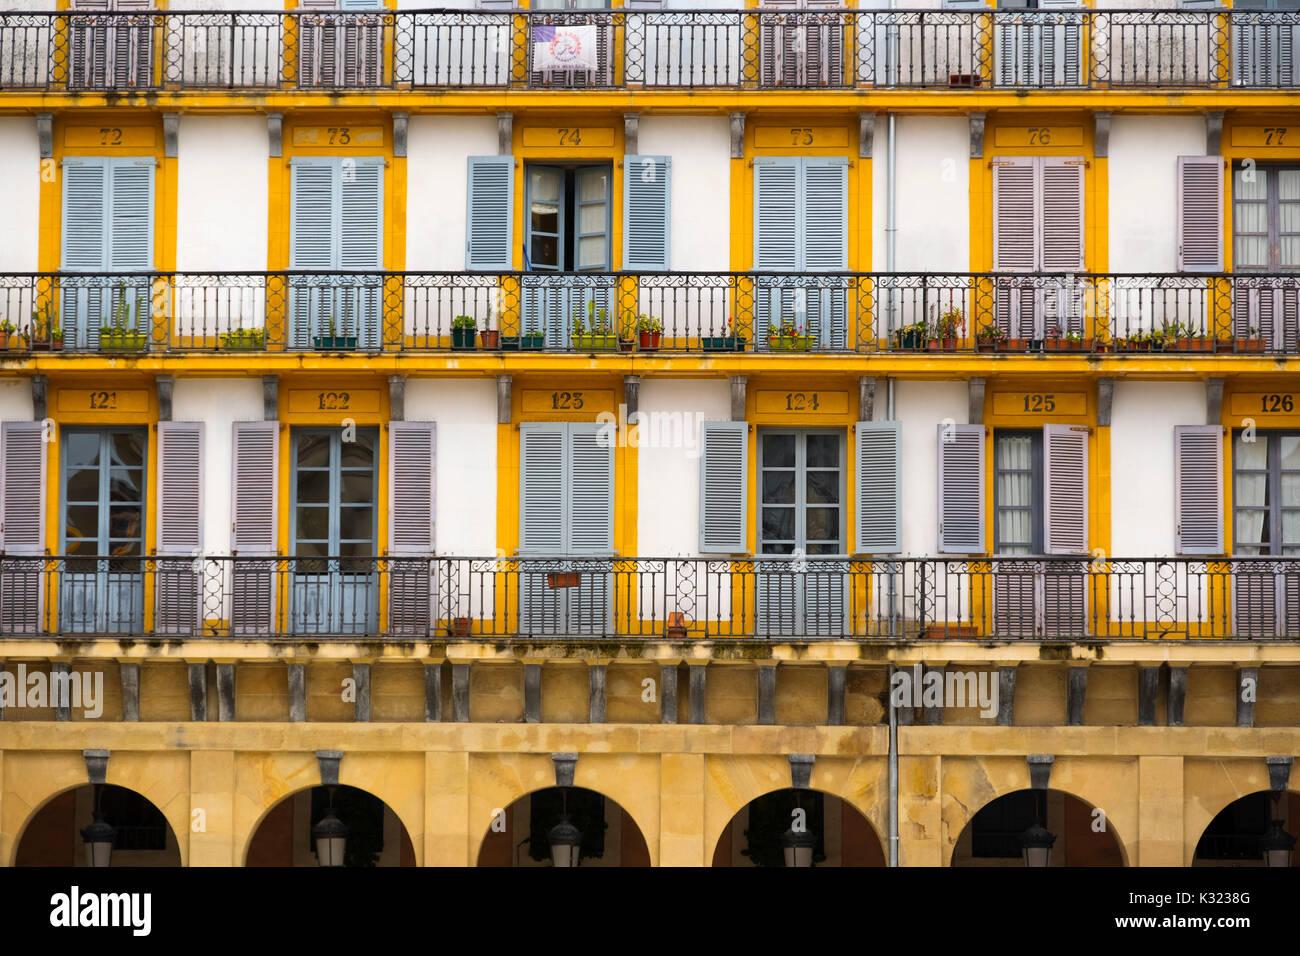 Constitution Square. Plaza de la Constitucion. Donostia. San Sebastian. Gipuzkoa. Basque Country. Spain Europe - Stock Image